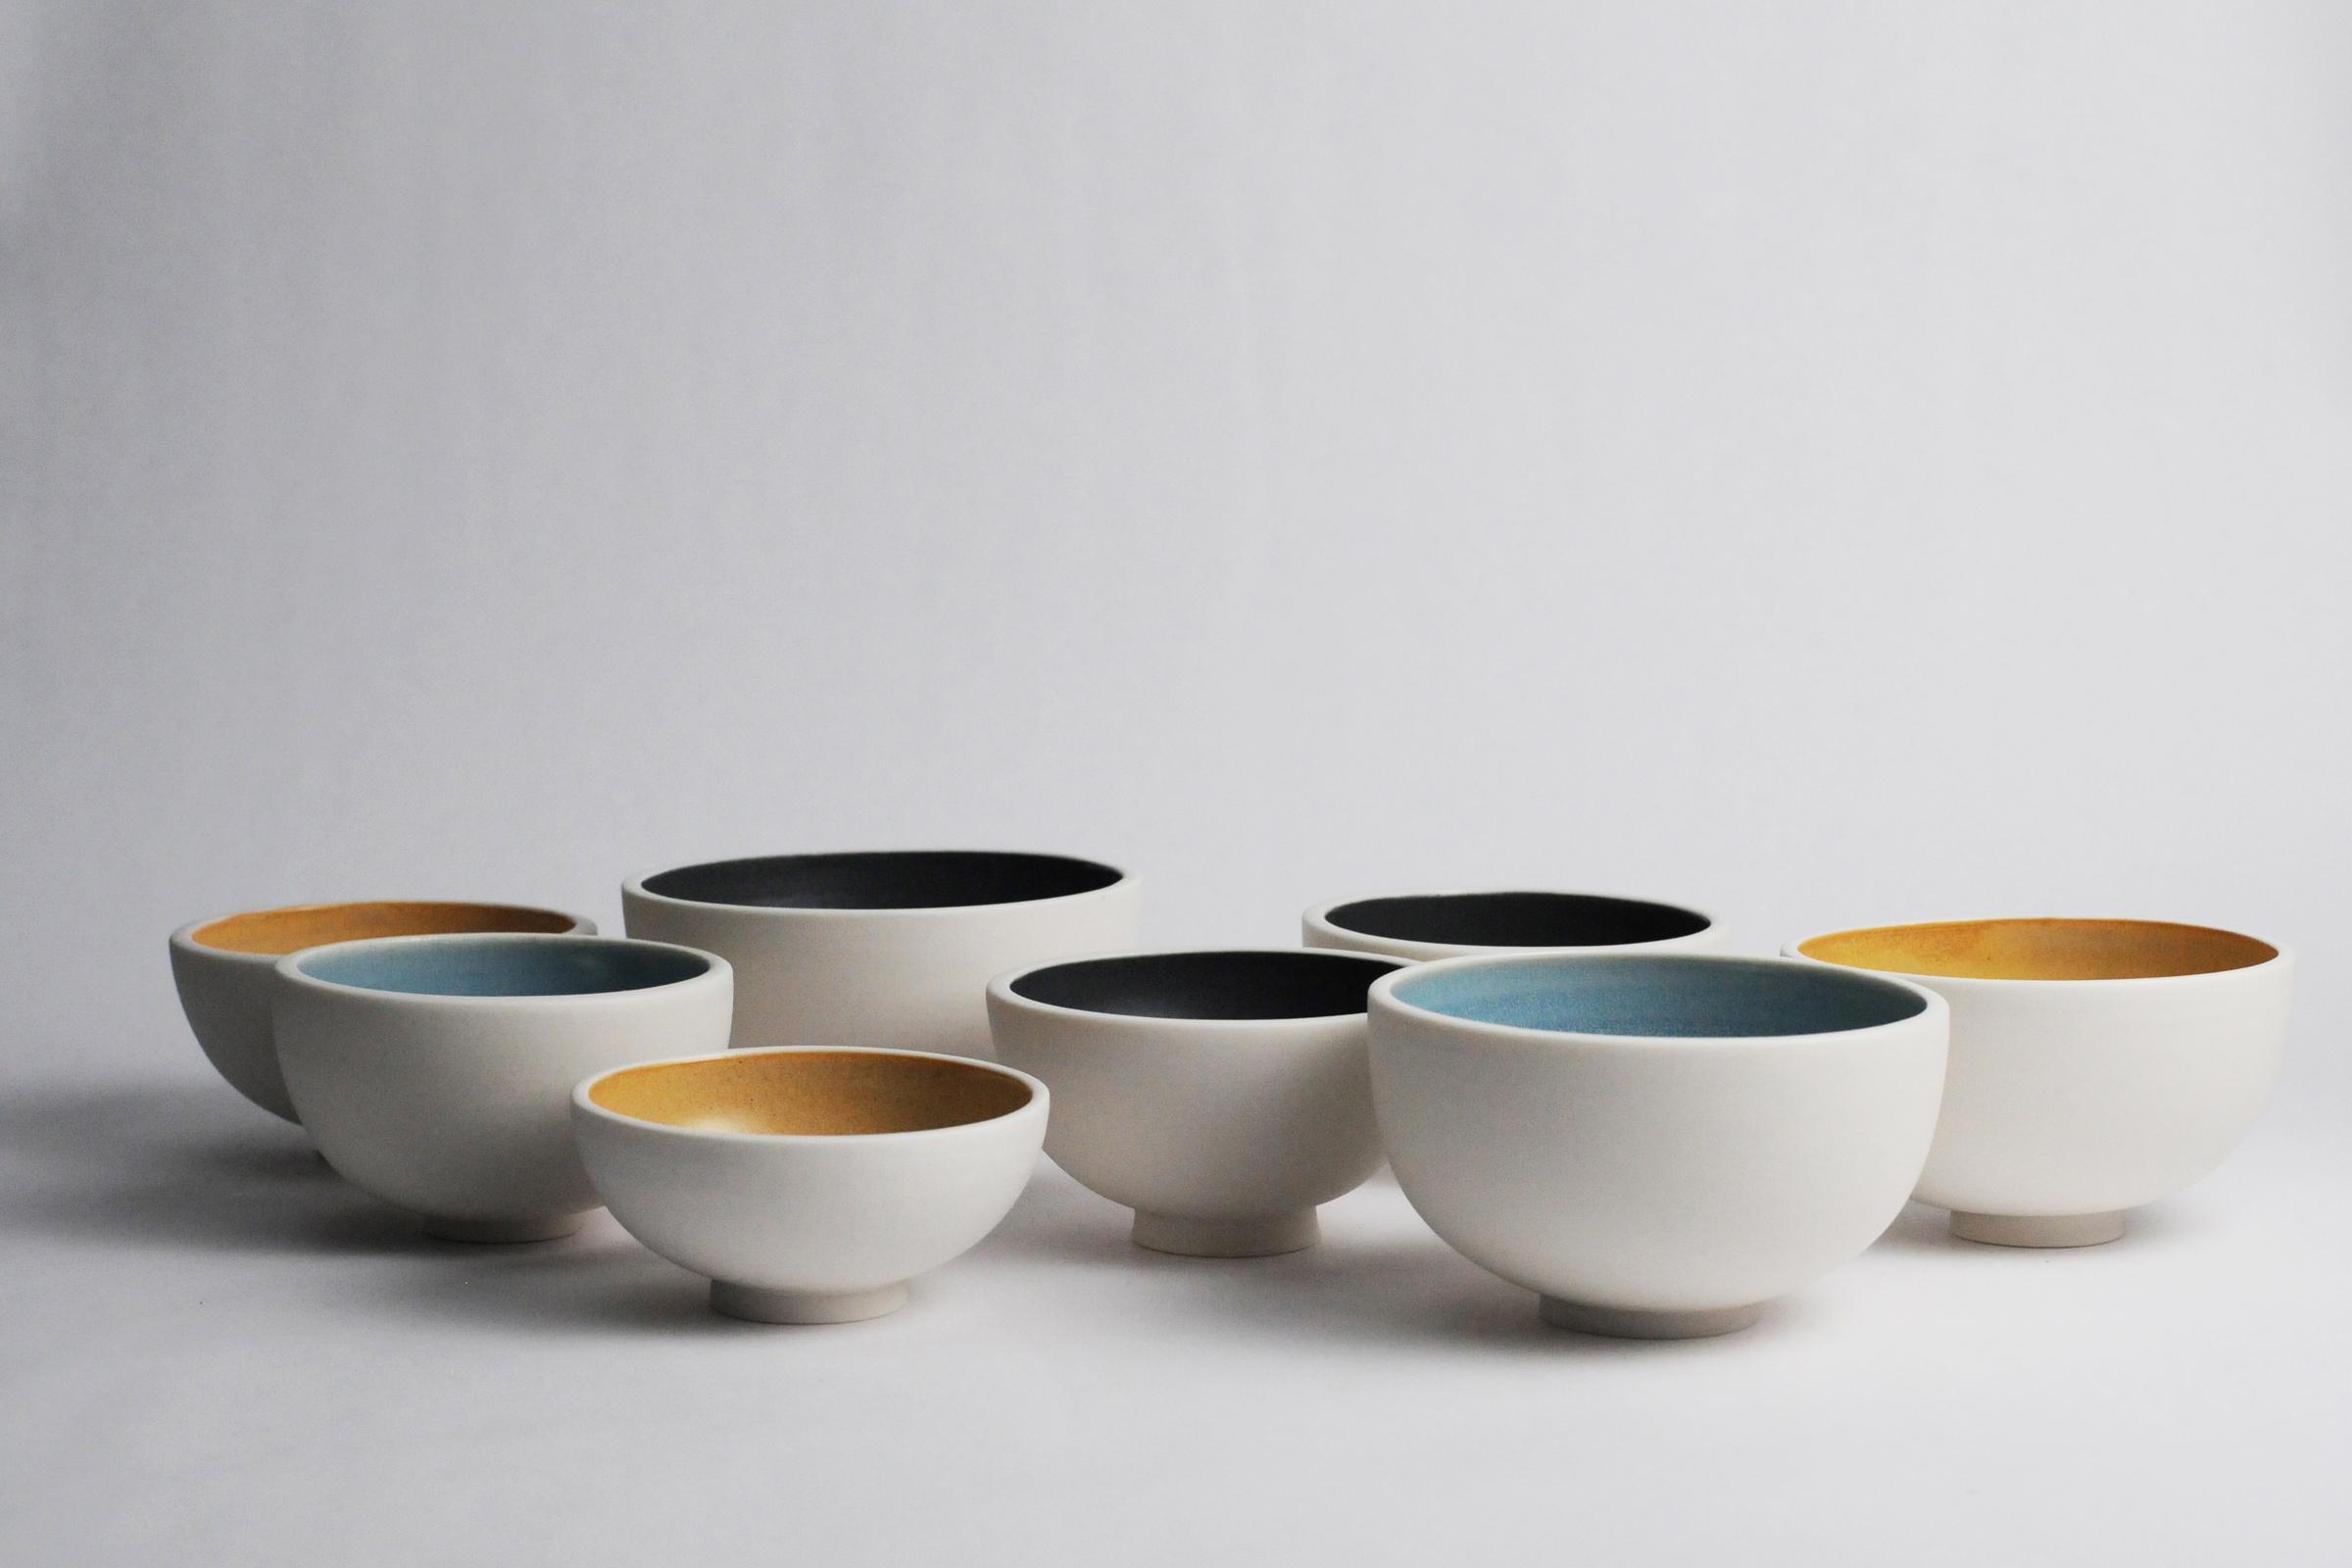 bowl_sround_frost_multi2.jpg